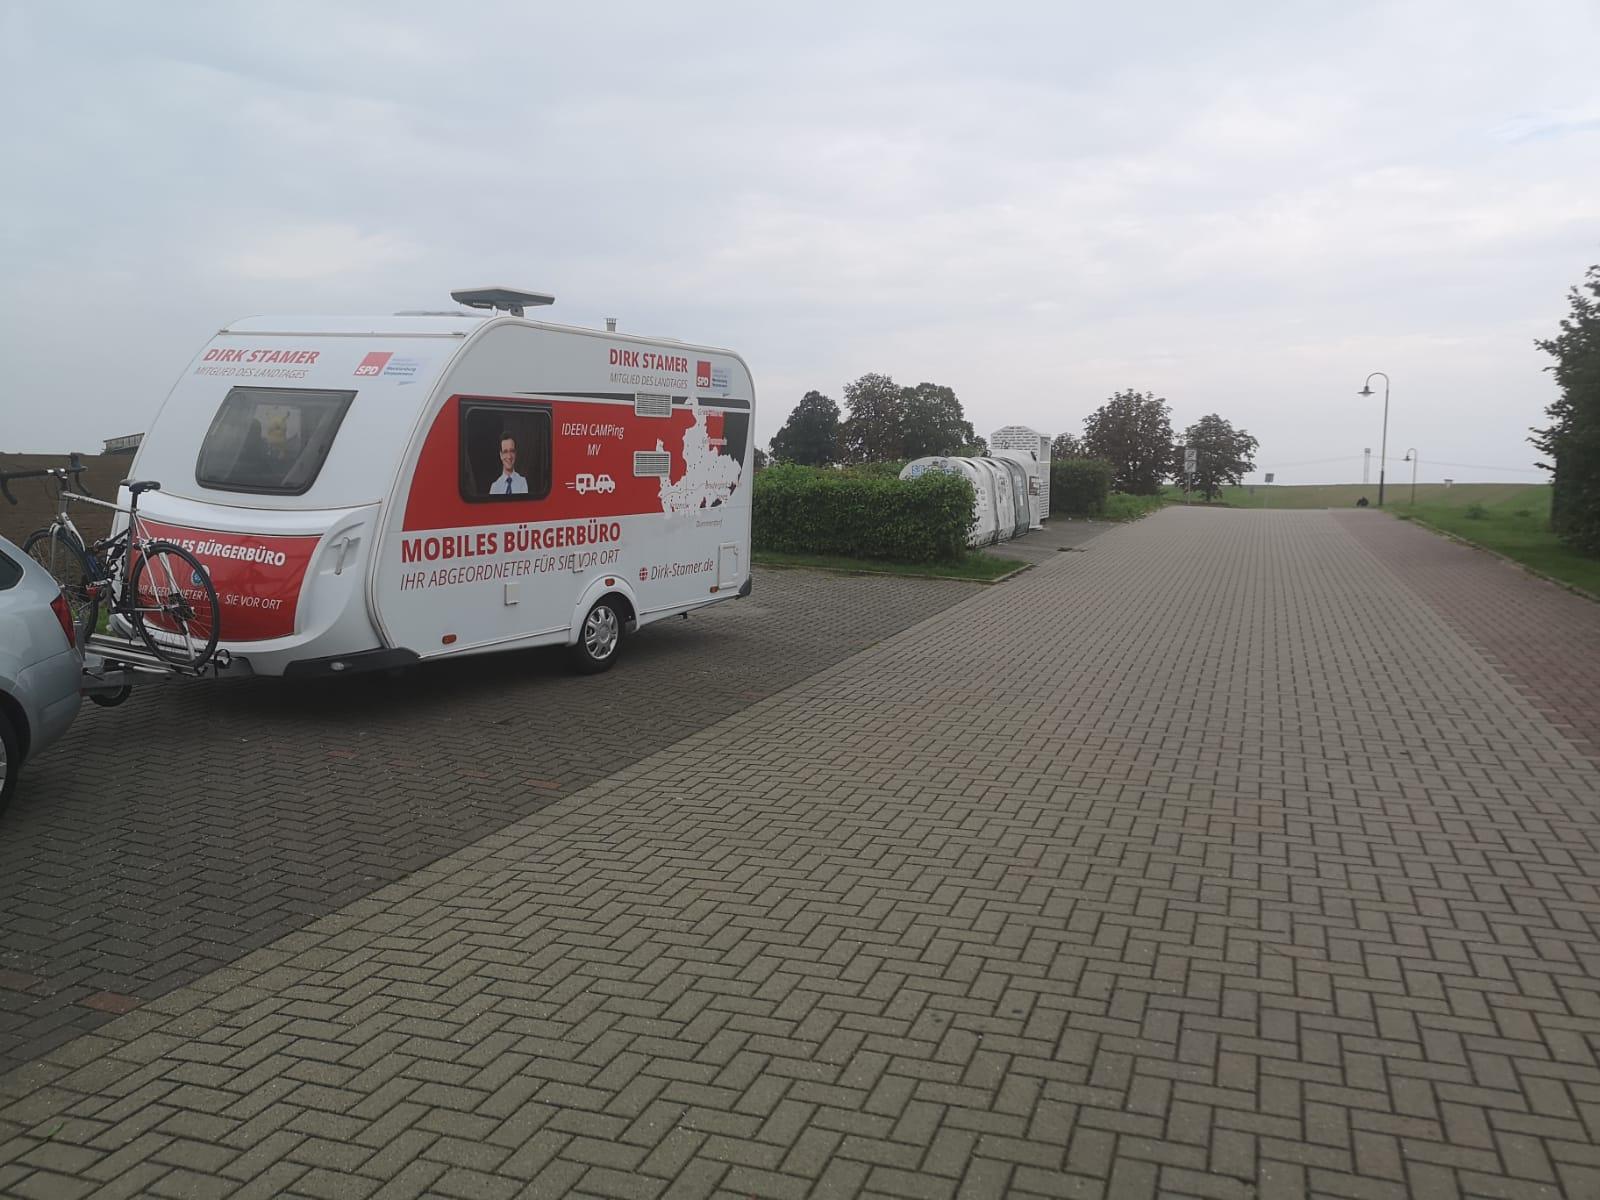 Bürgerbüro vor Ort in Papendorf